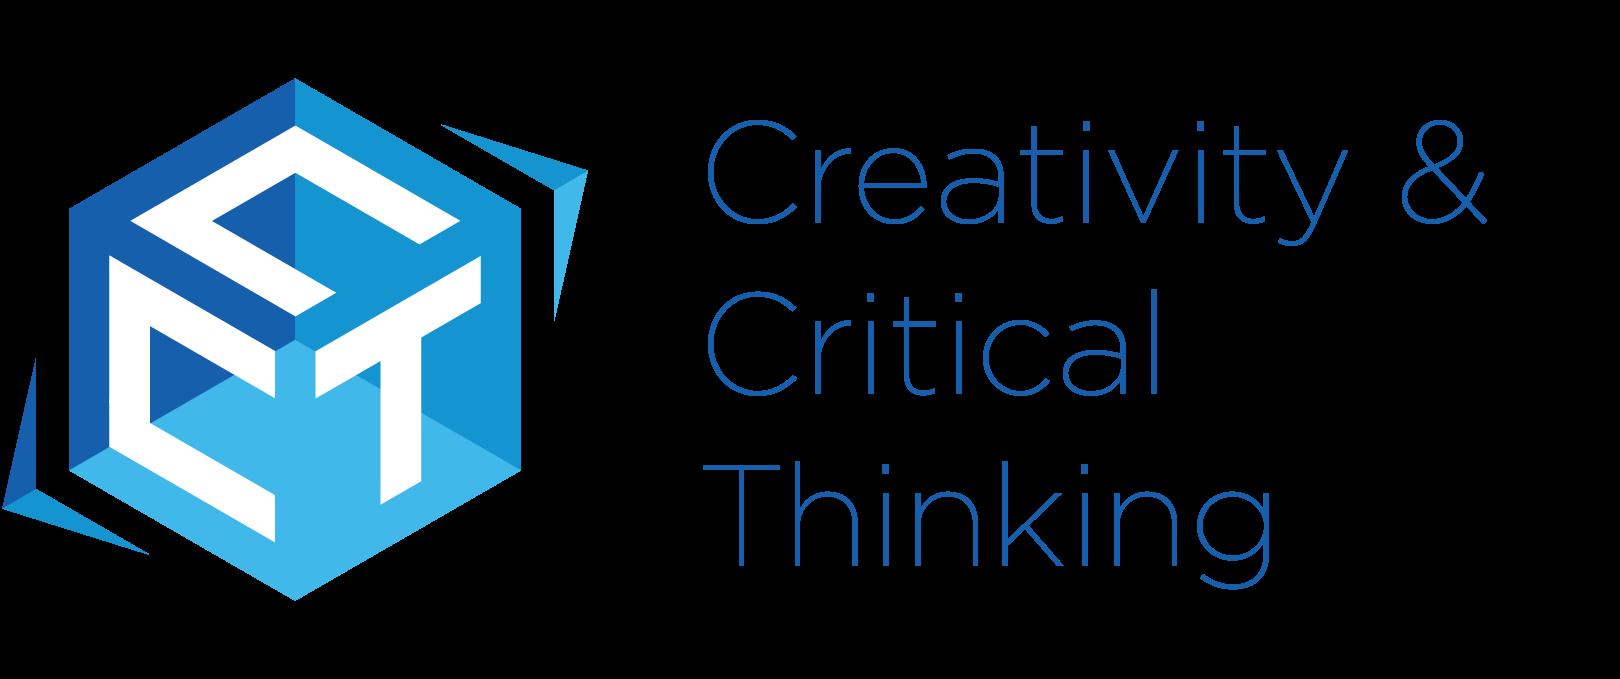 Creativity & Critical Thinking